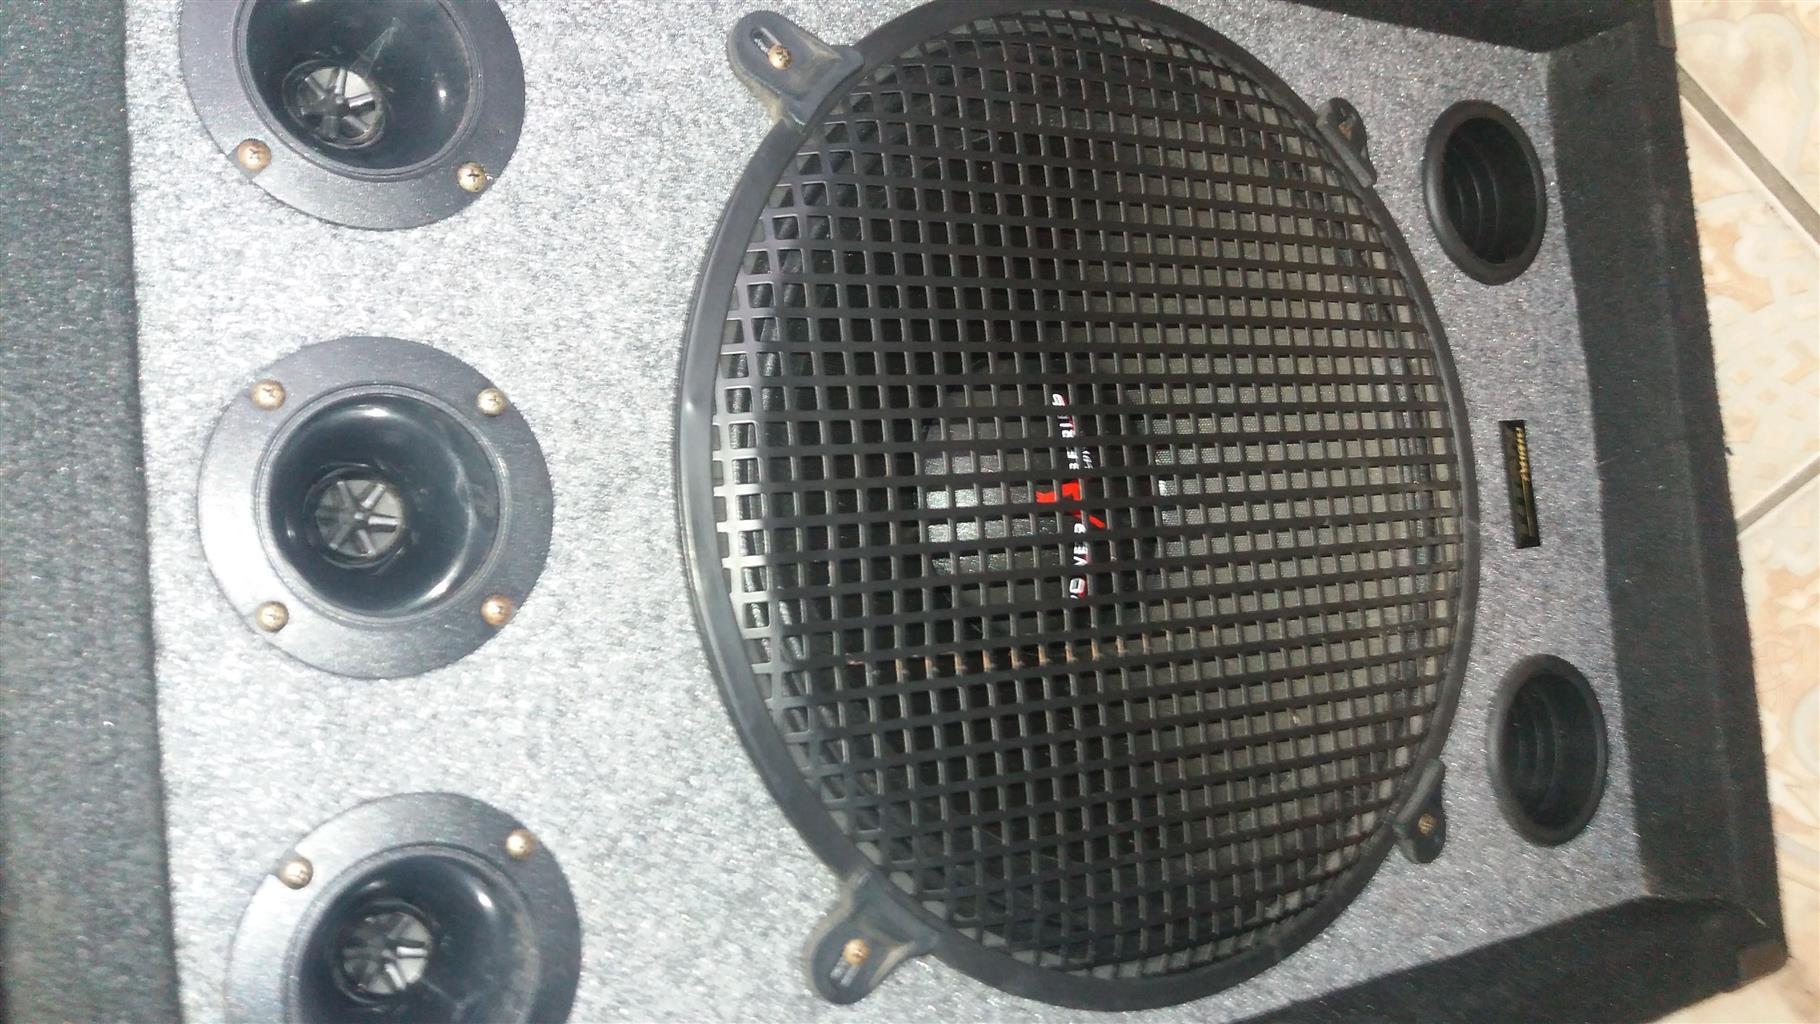 High Powered Speakers